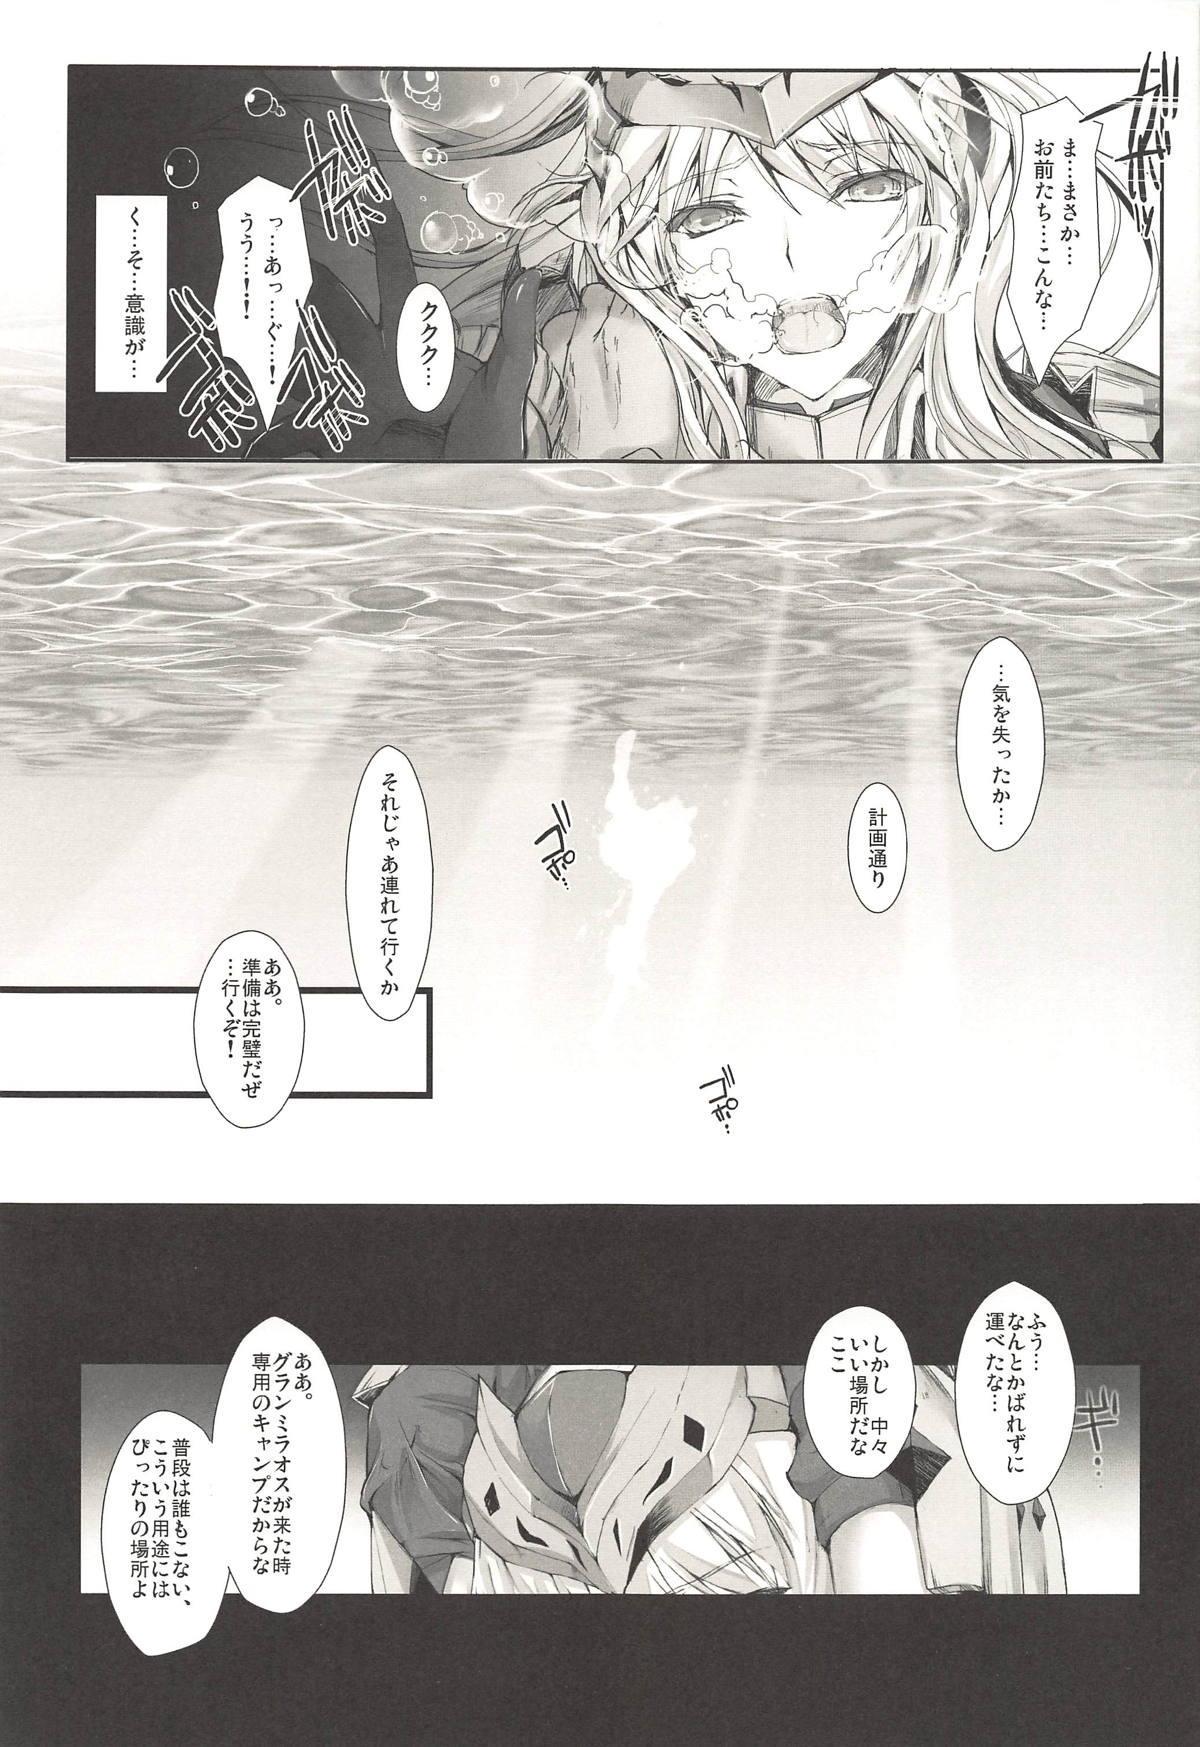 Monhan no Erohon G3 11→14+Juuhi+Omakebon Soushuuhen 83